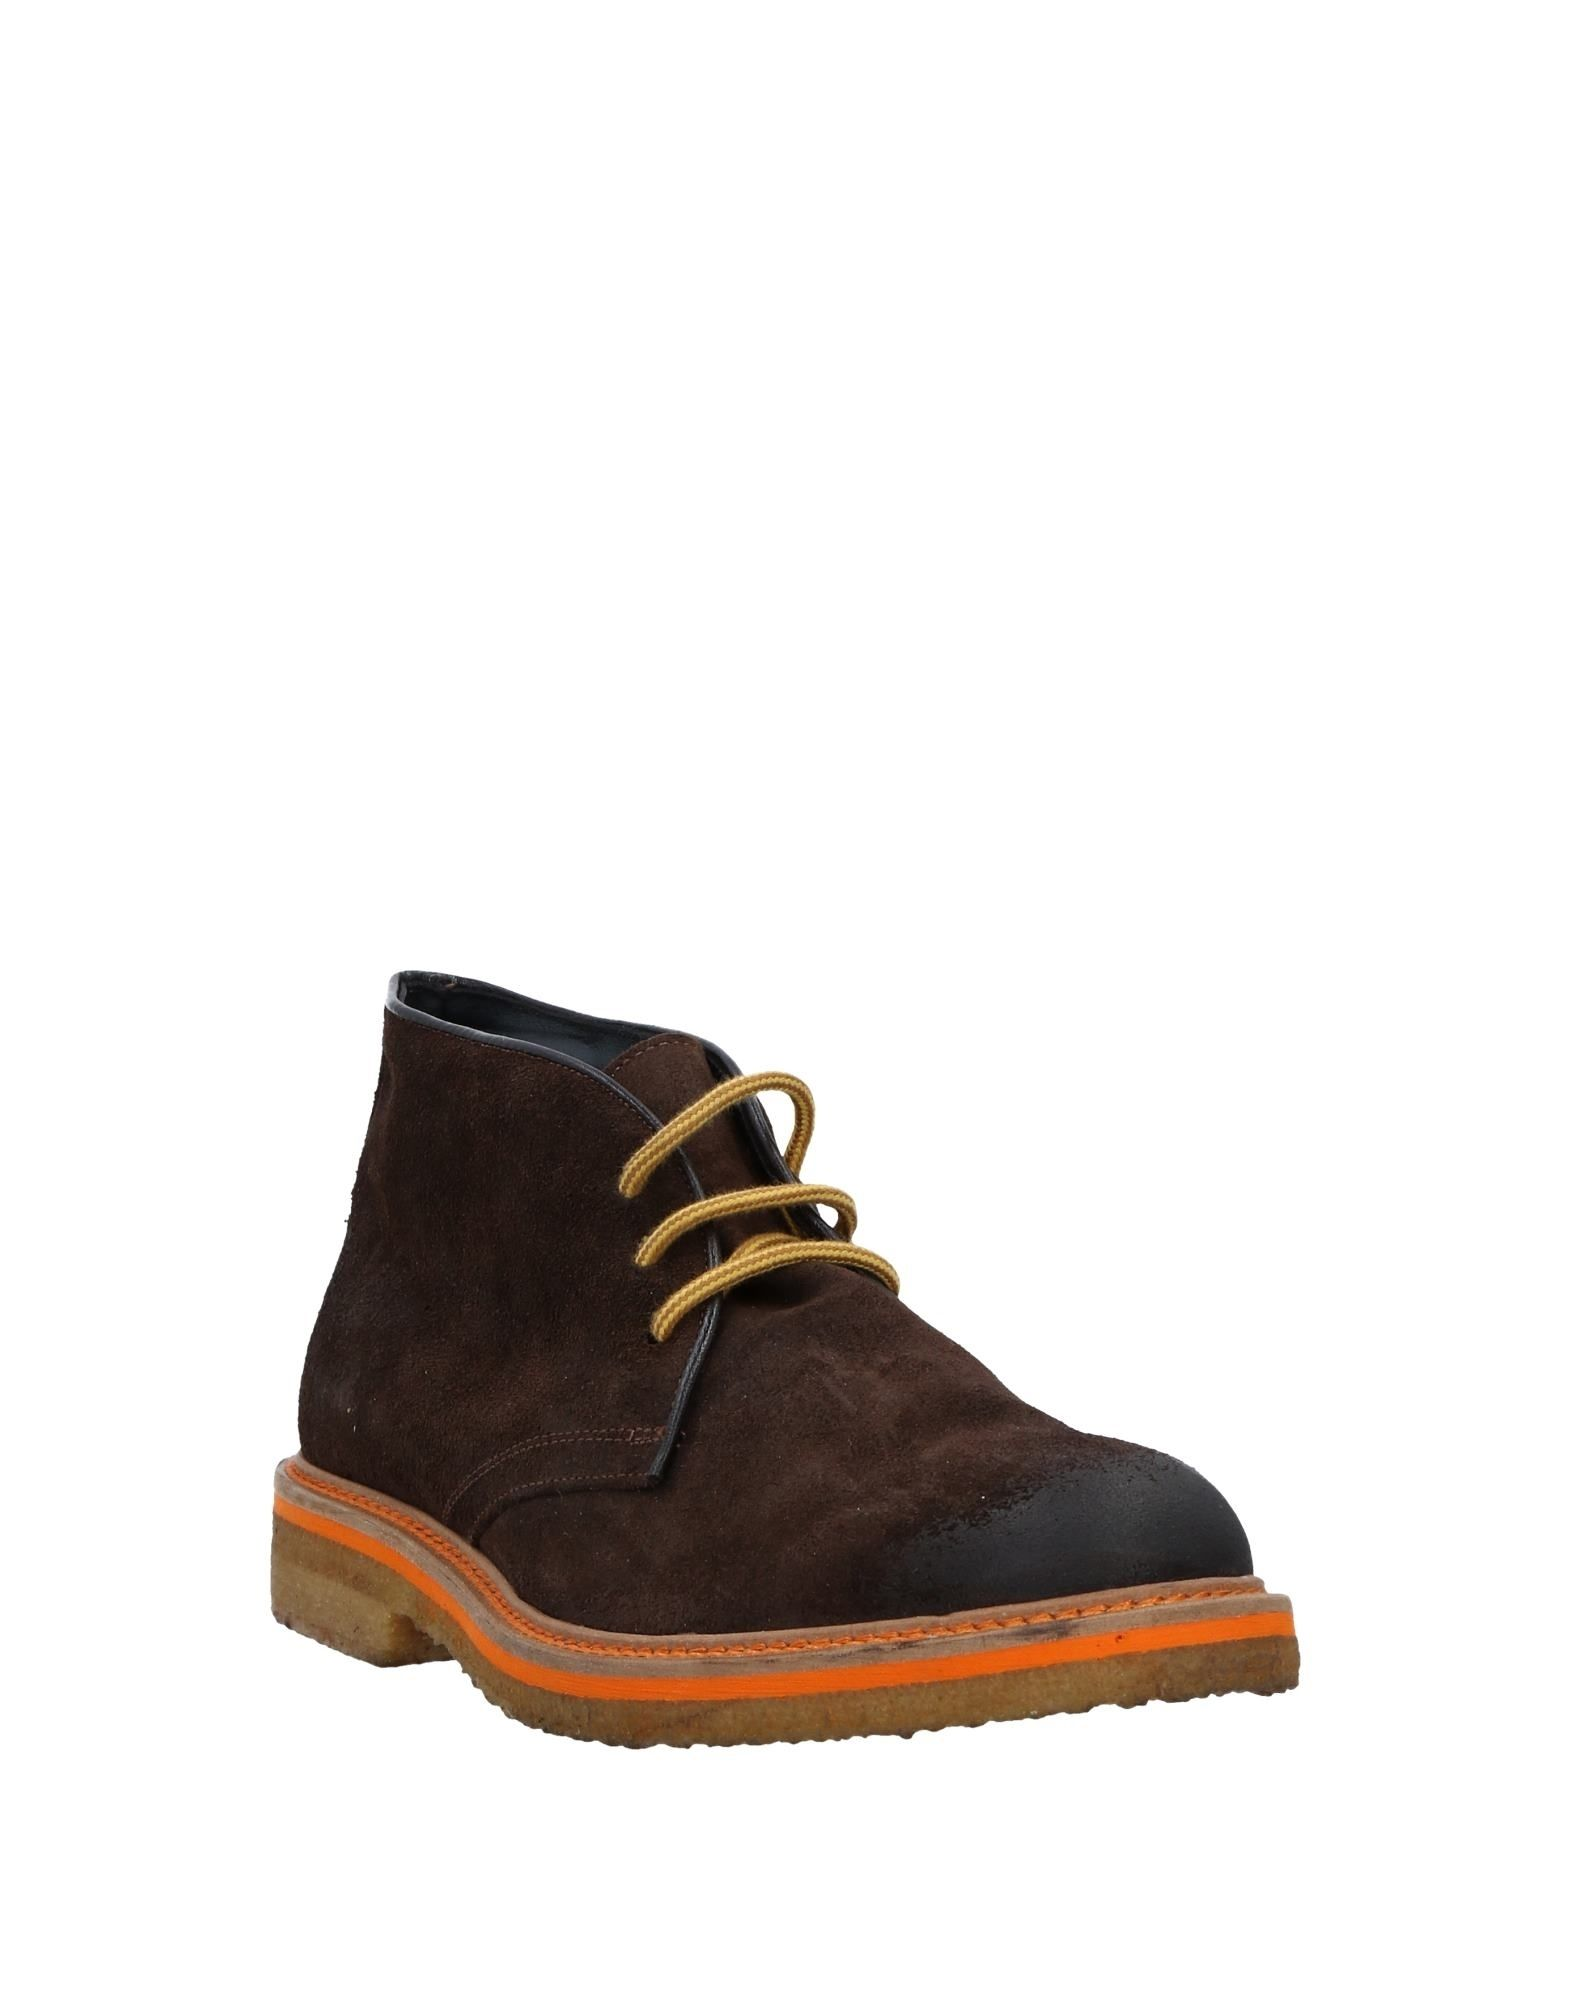 Rabatt echte Stiefelette Schuhe Bagatt Stiefelette echte Herren  11516353MH 60405d